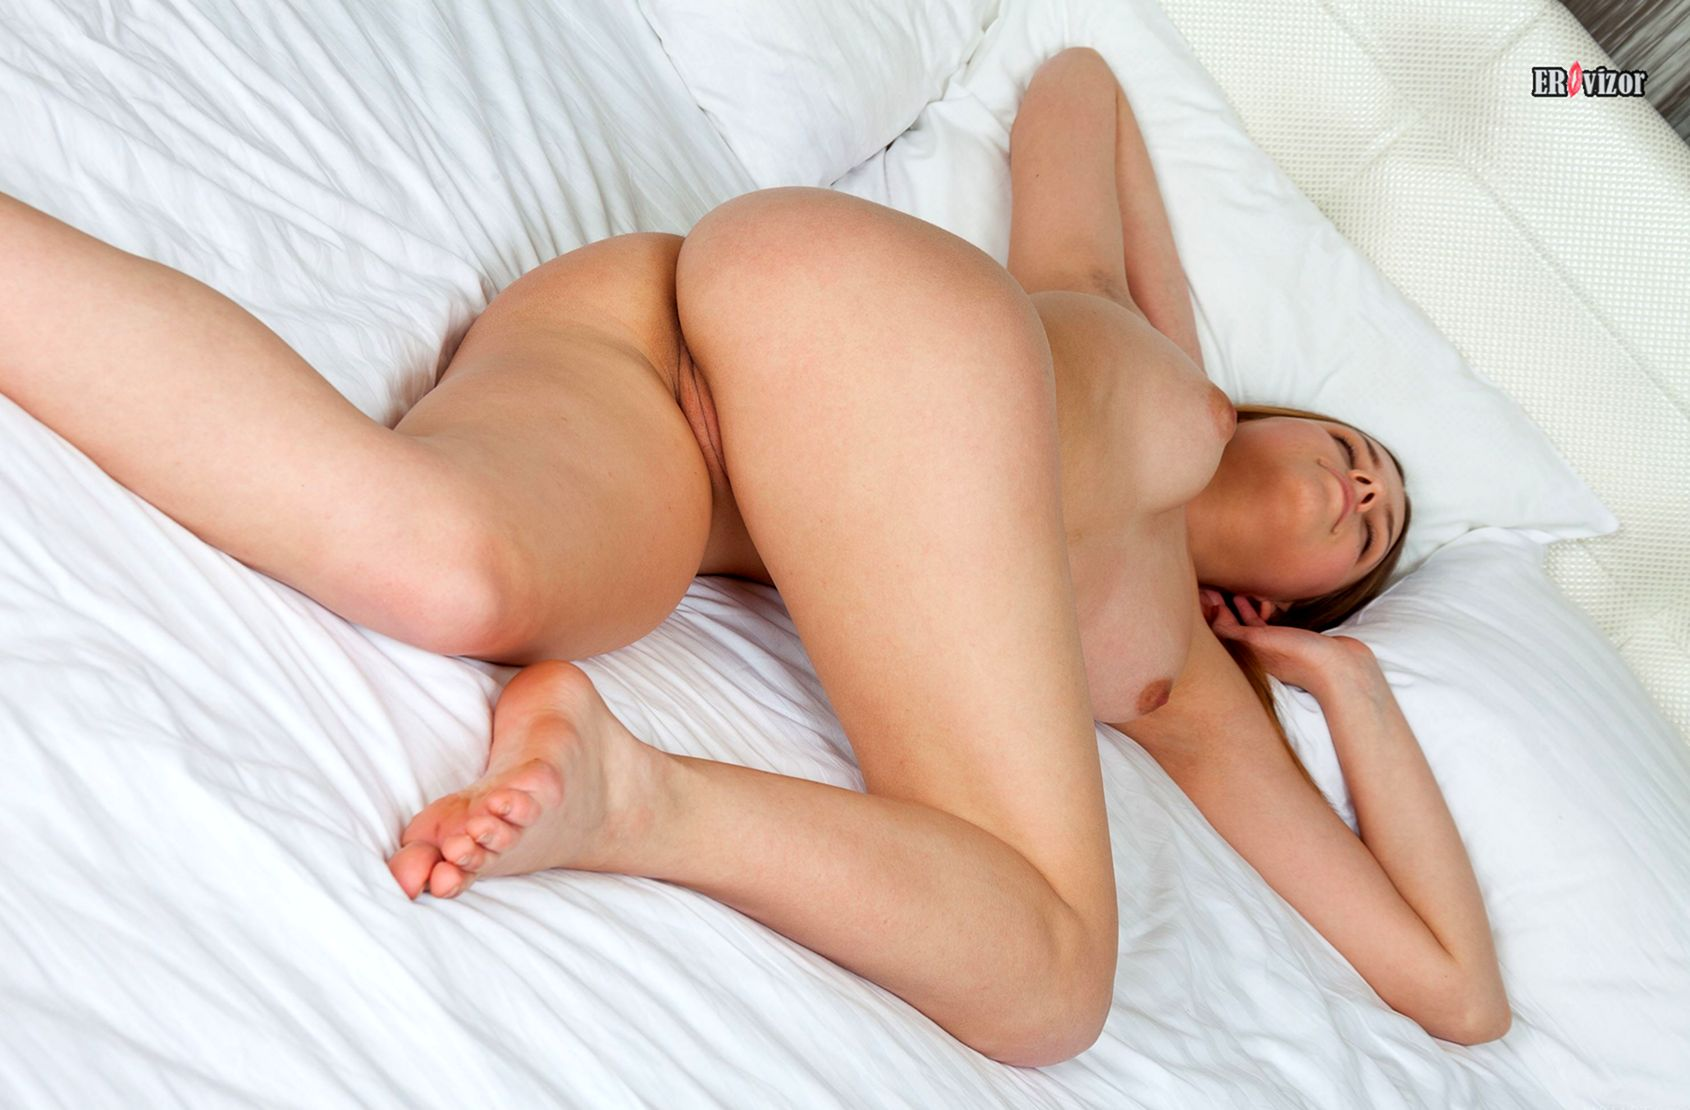 sensual_pose_beauty_women (14)